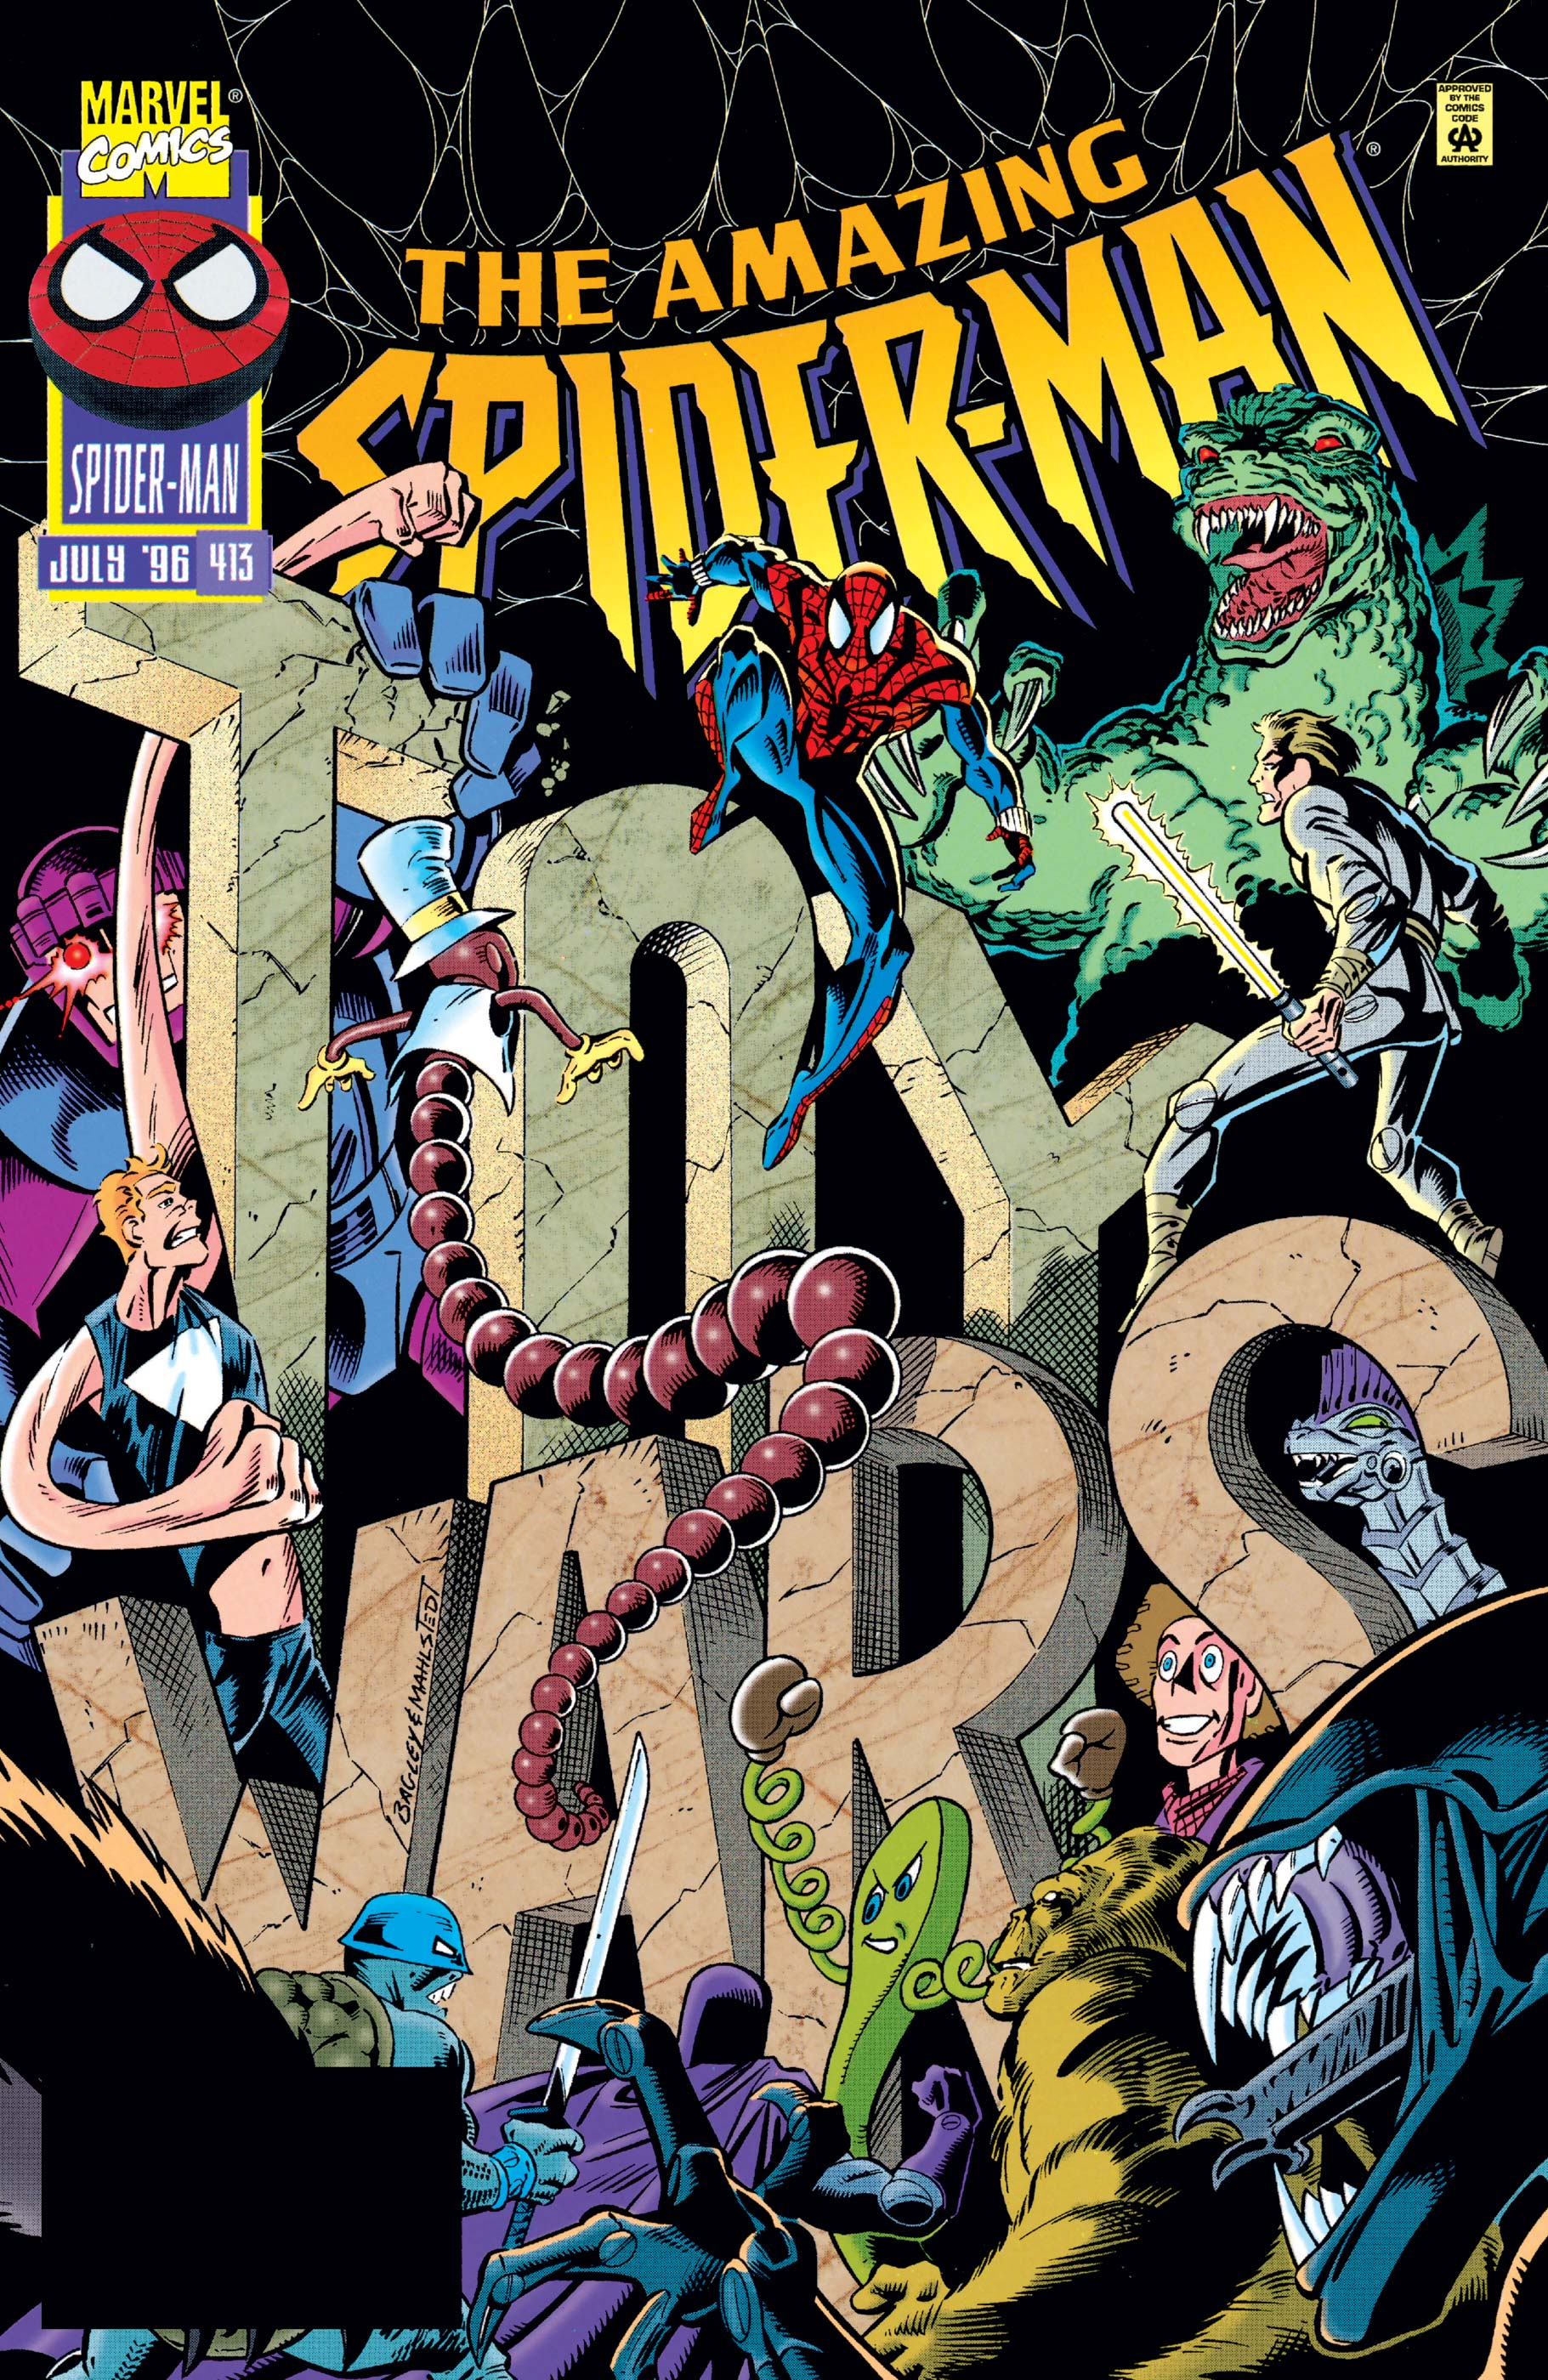 The Amazing Spider-Man (1963) #413